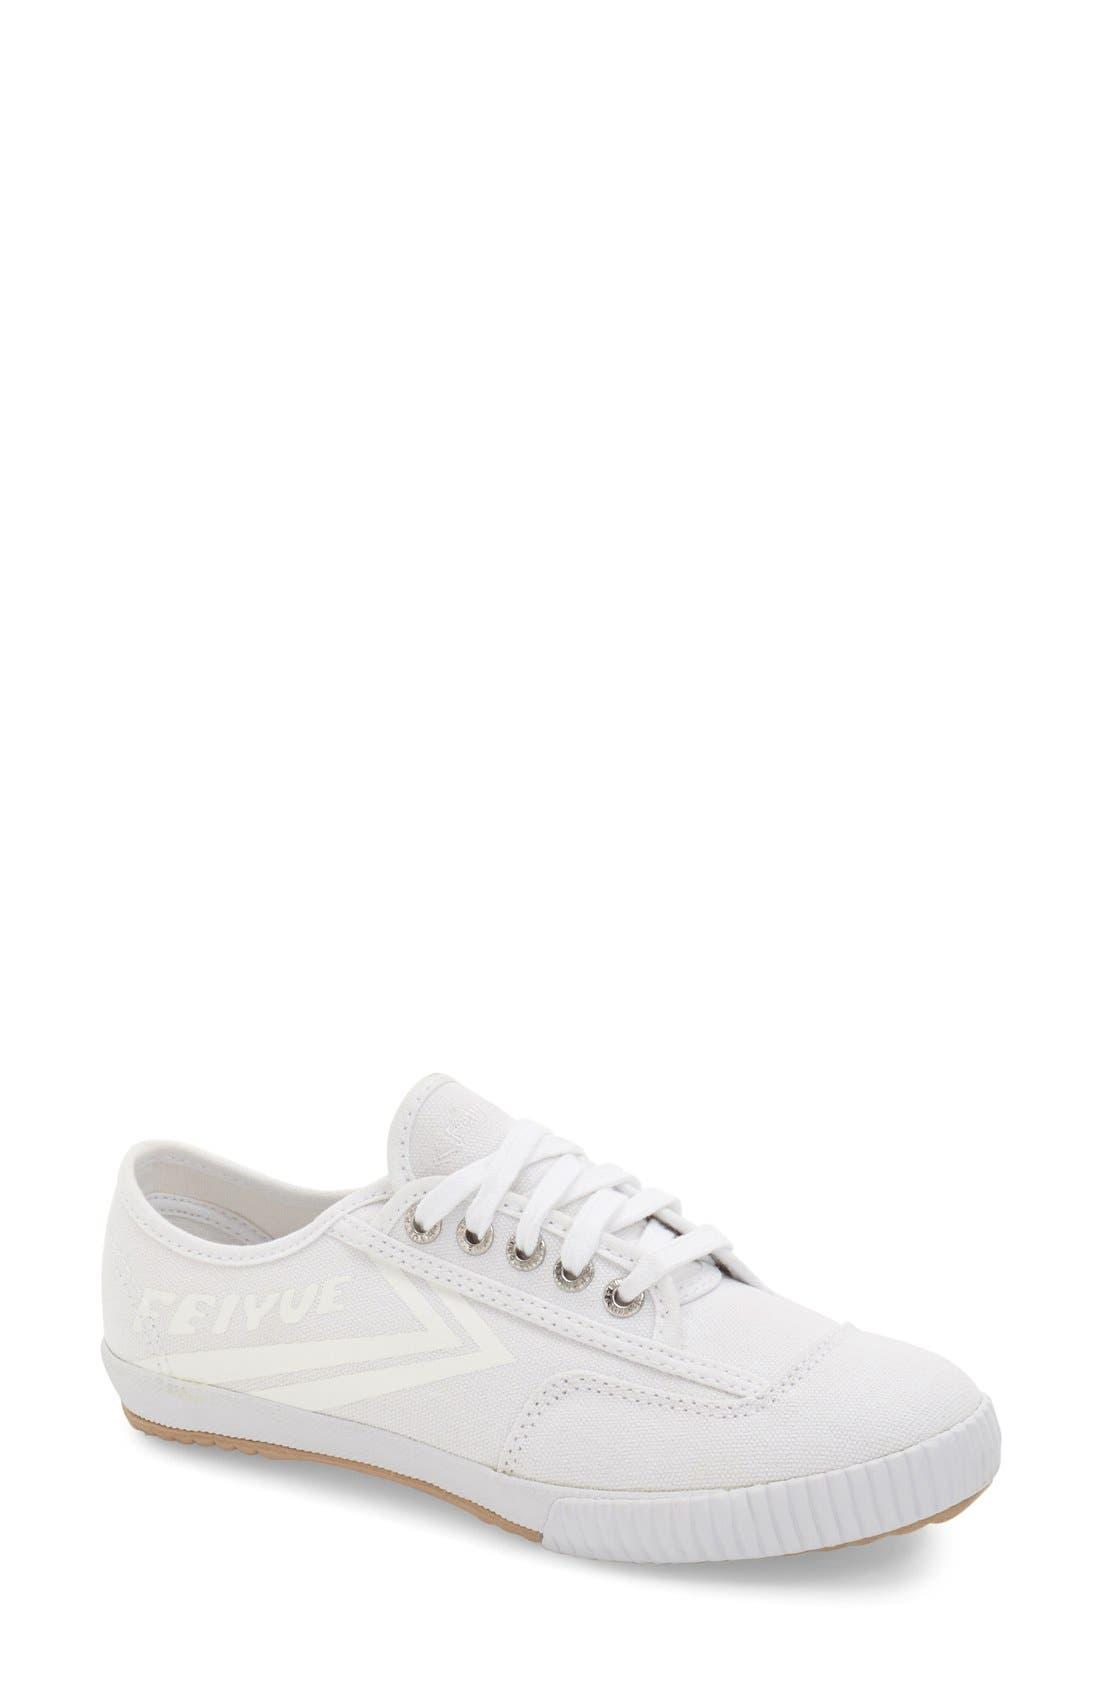 Alternate Image 1 Selected - Feiyue. 'Fe Lo Plain' Canvas Sneaker (Women)